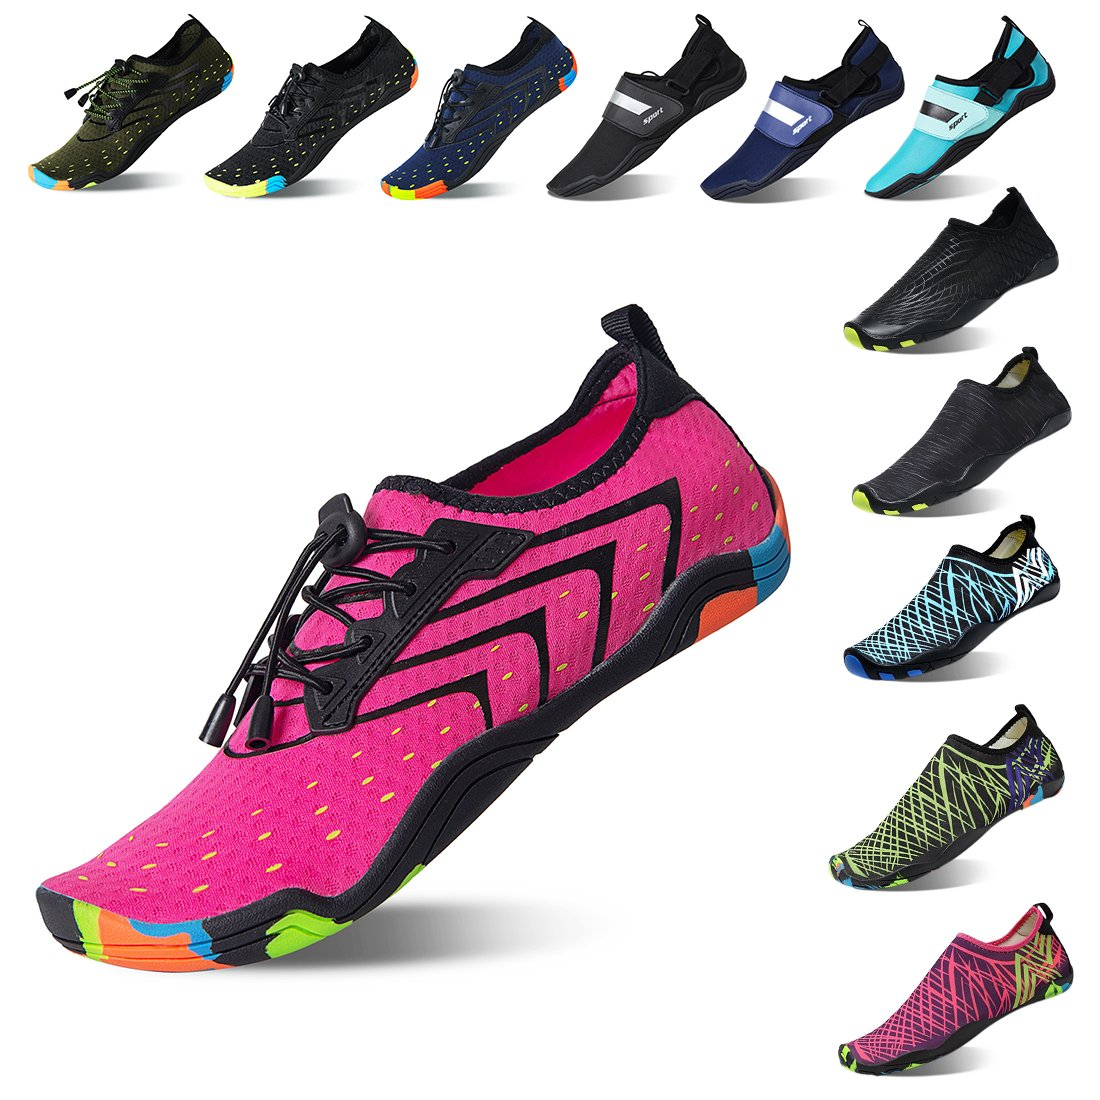 Lauwodun Womens Mens Quick Dry Water Shoes Barefoot Aqua Sock Shoes Beach Surfing Yoga Running Exercise -Pink40